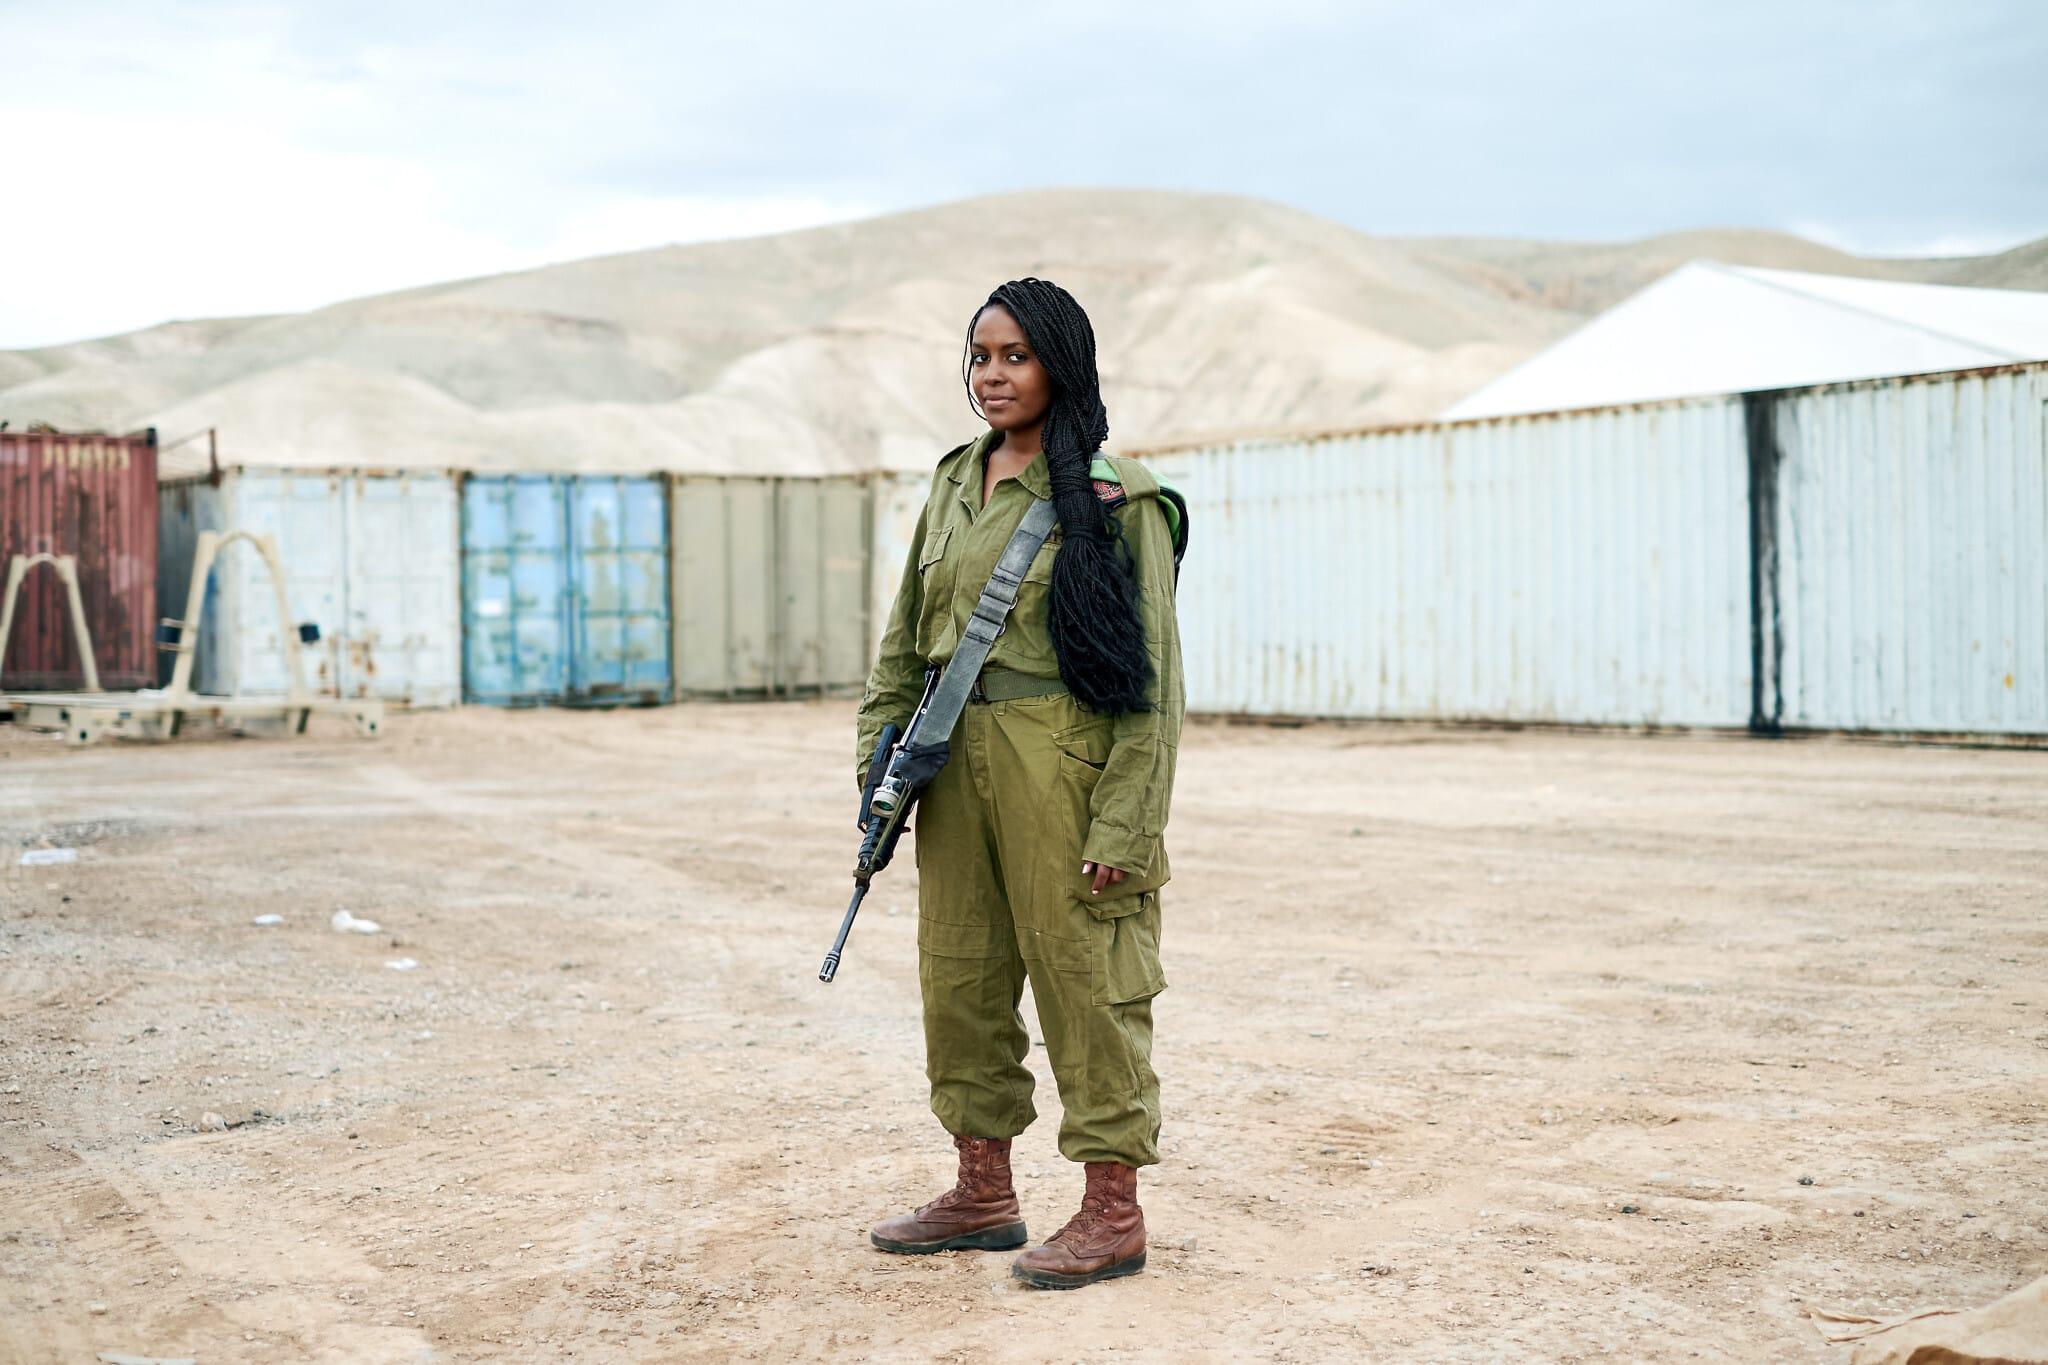 "סיסית, מאדיס אבבה, אתיופיה. חיילת חי""ר (צילום: ברנט סלומוביץ')"